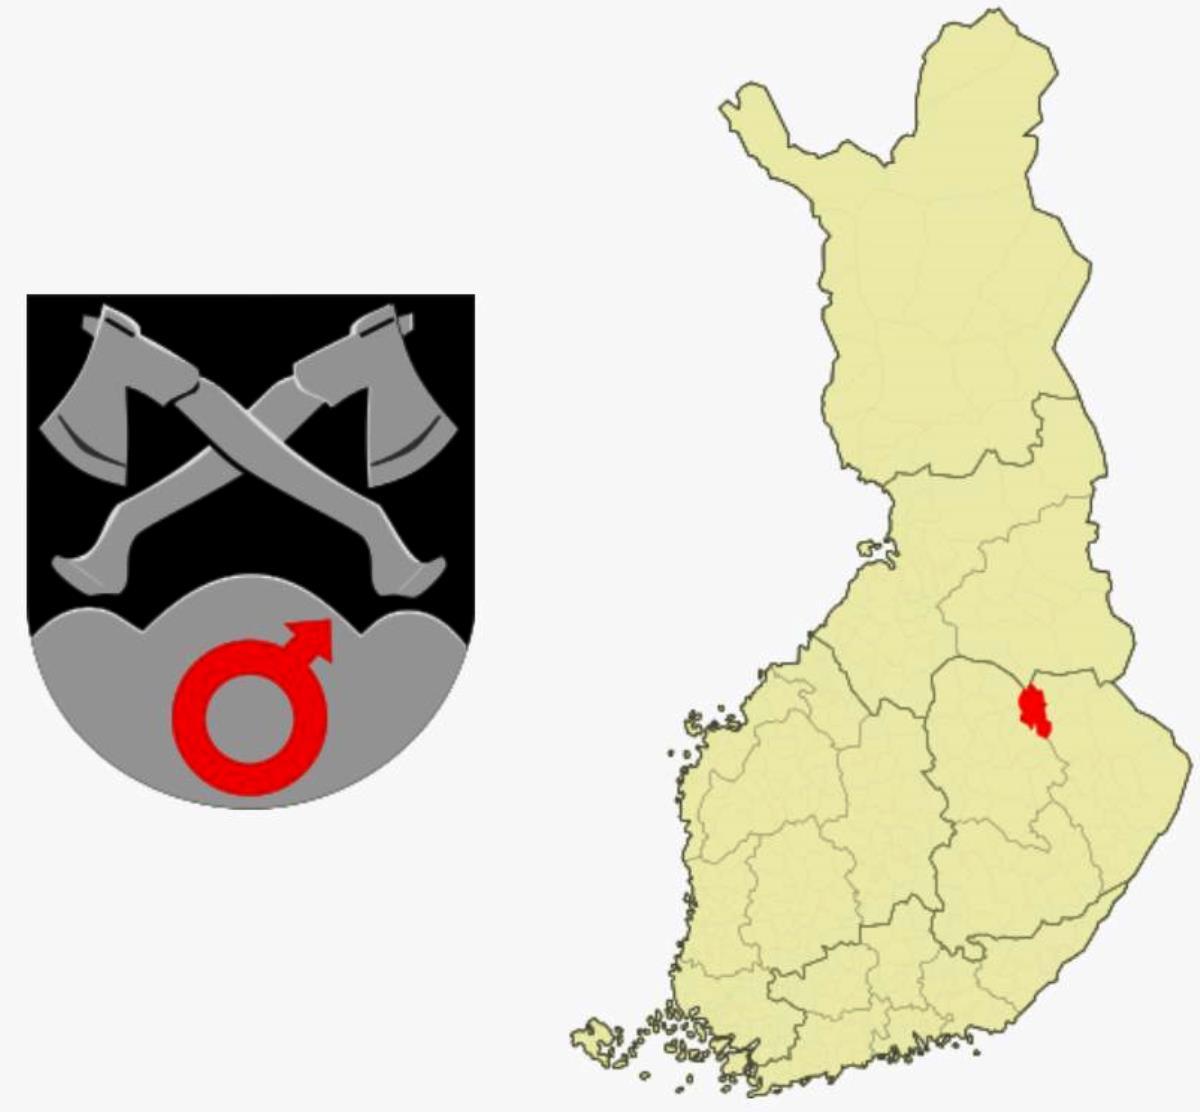 Rautavaaran kunnan vaakuna ja sijainti.